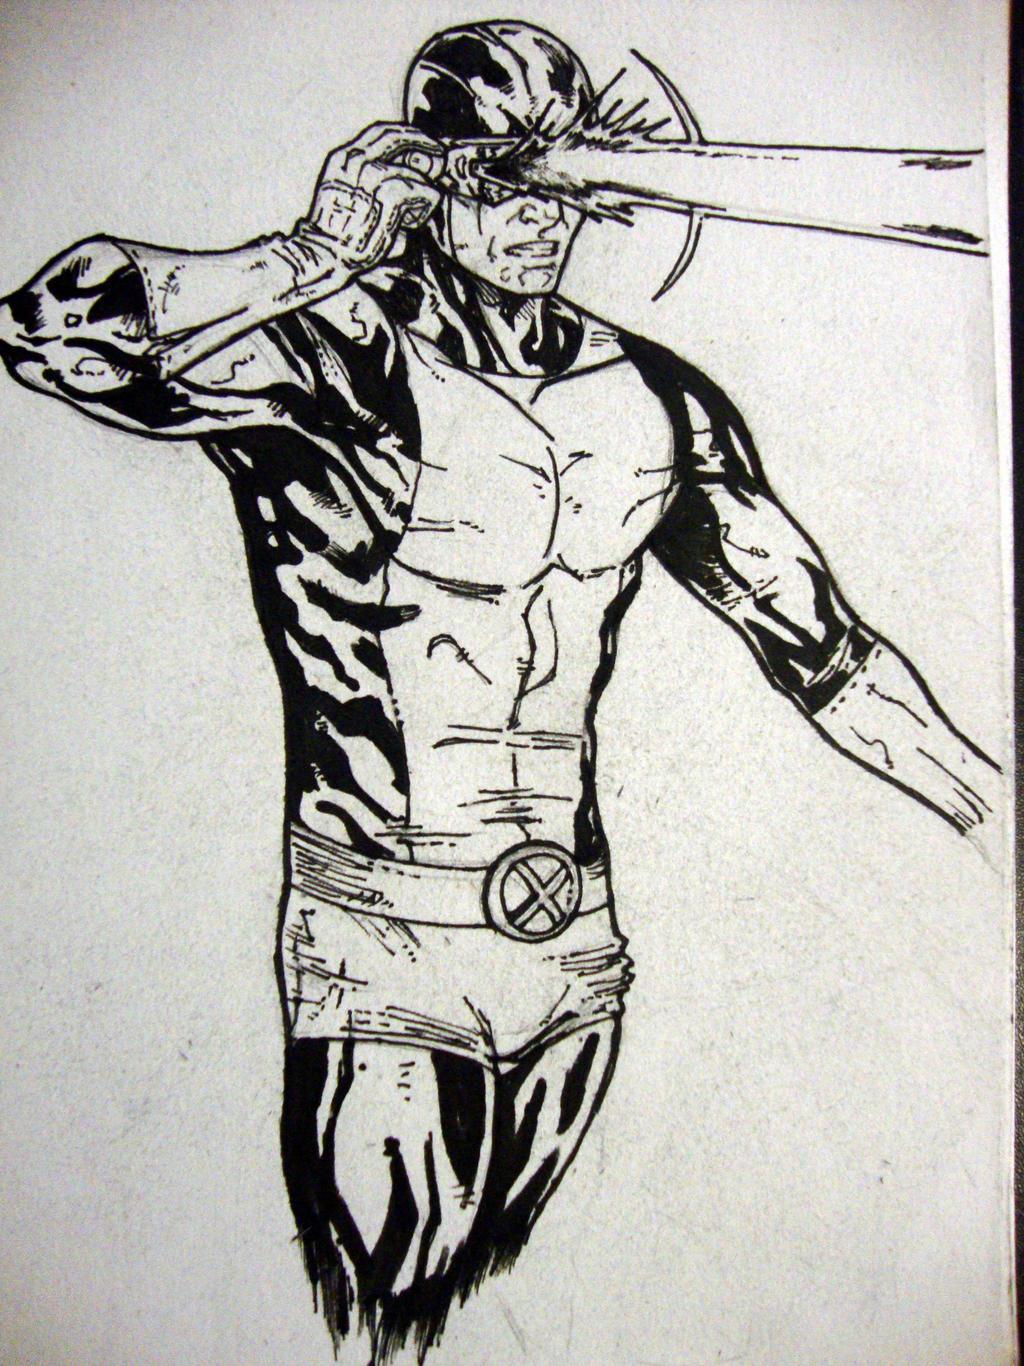 Cyclops Sketch by IgorChakal